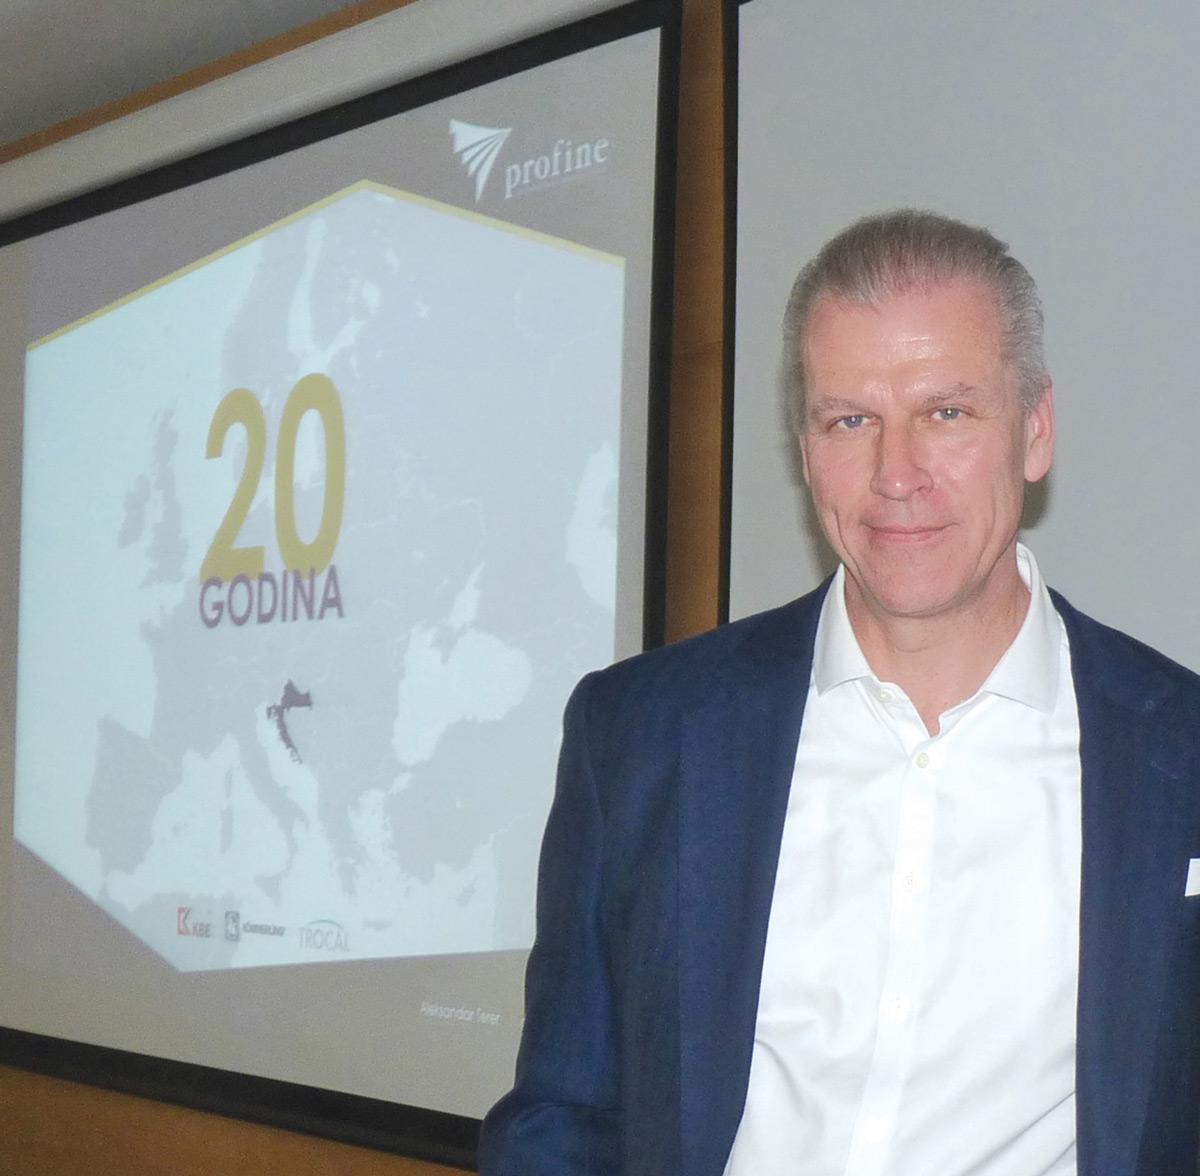 Dr. Peter Mrosik, vlasnik i CEO profine Group GmbH